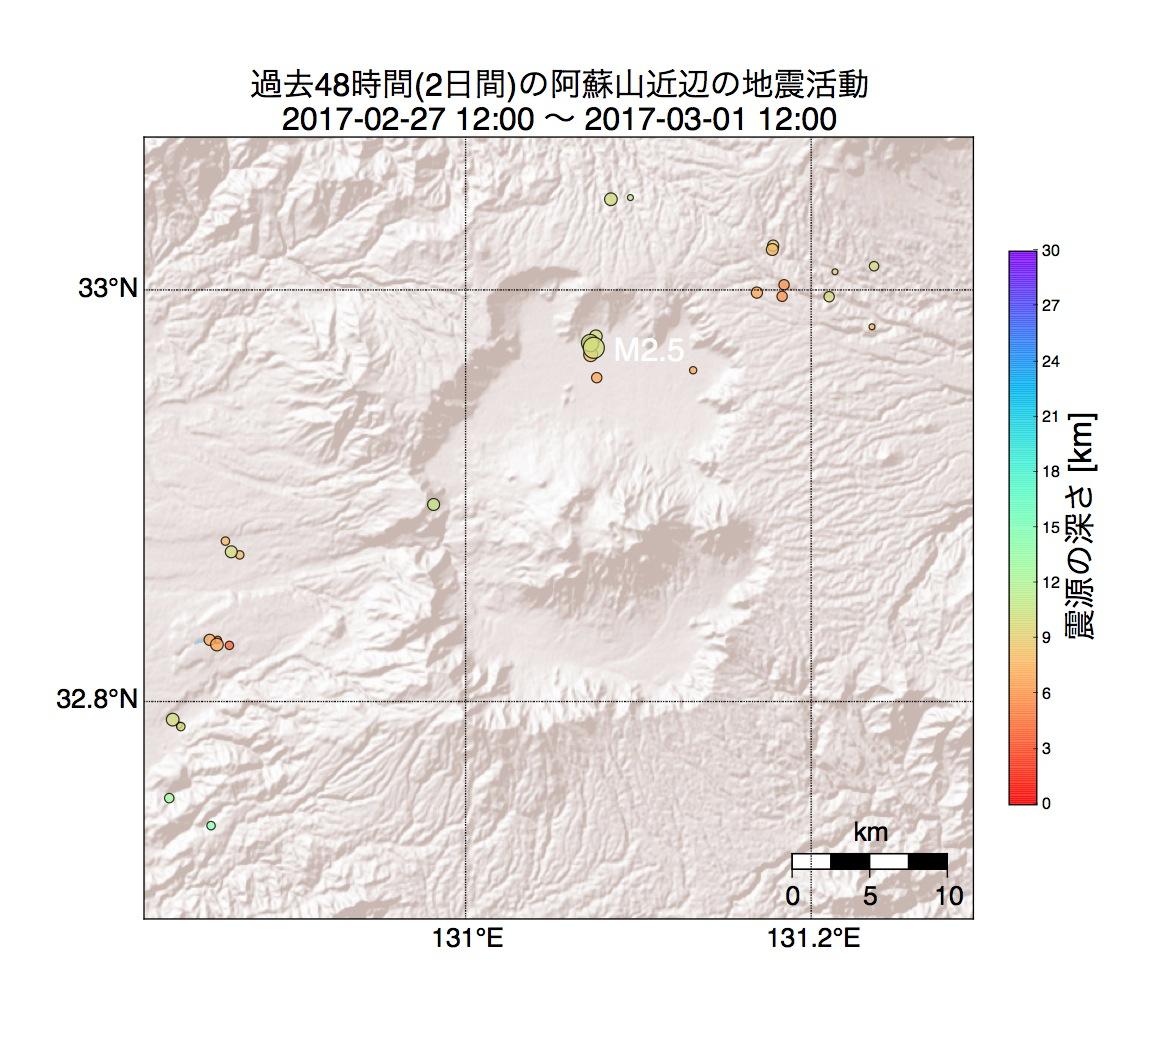 http://jishin.chamu.org/aso/20170301_1.jpg